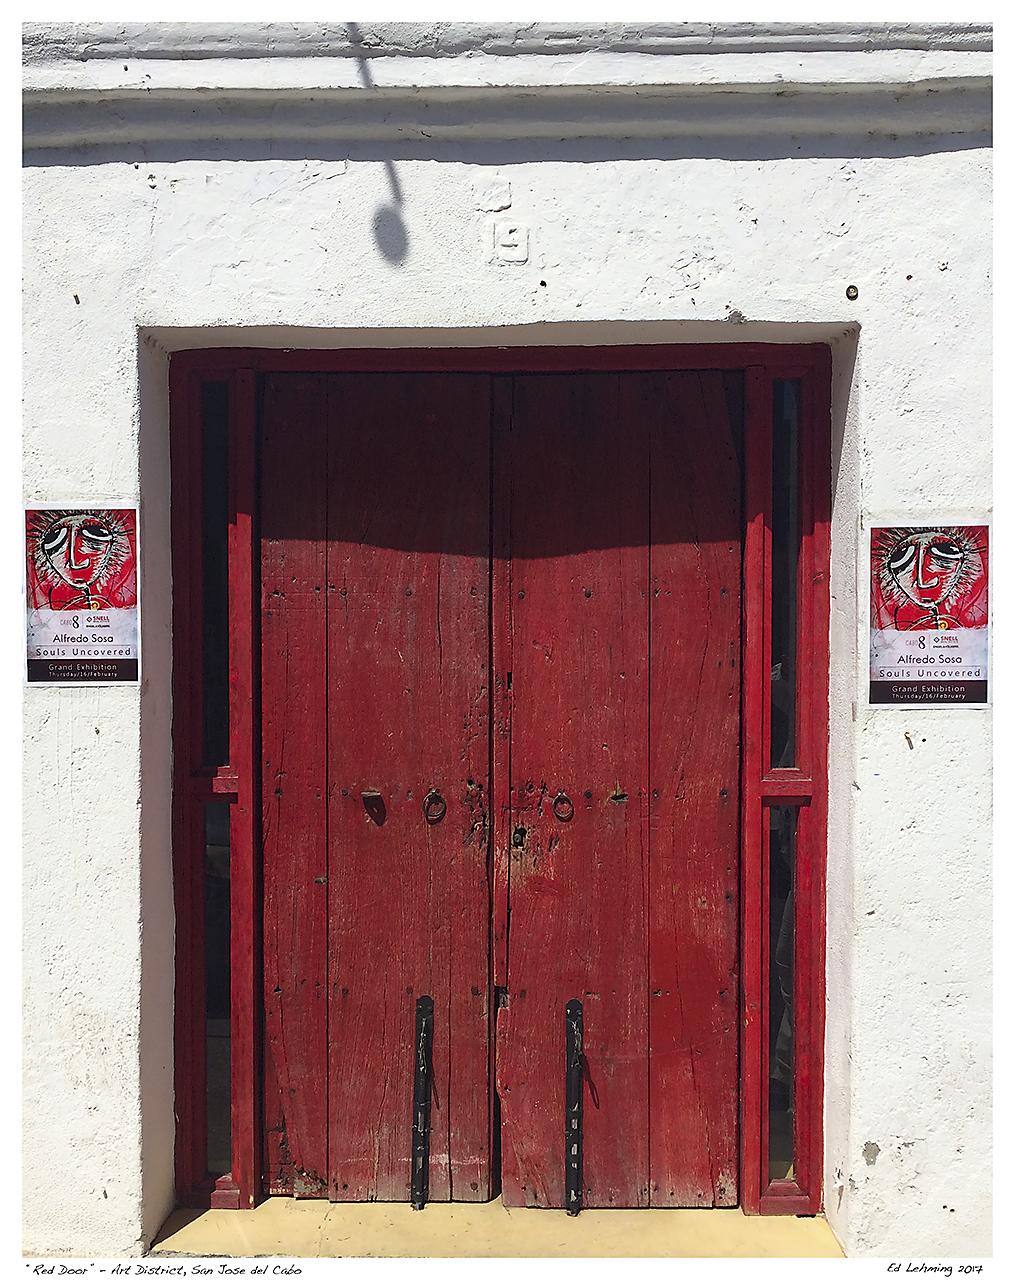 """Red Door"" - Art District, San Jose del Cabo"